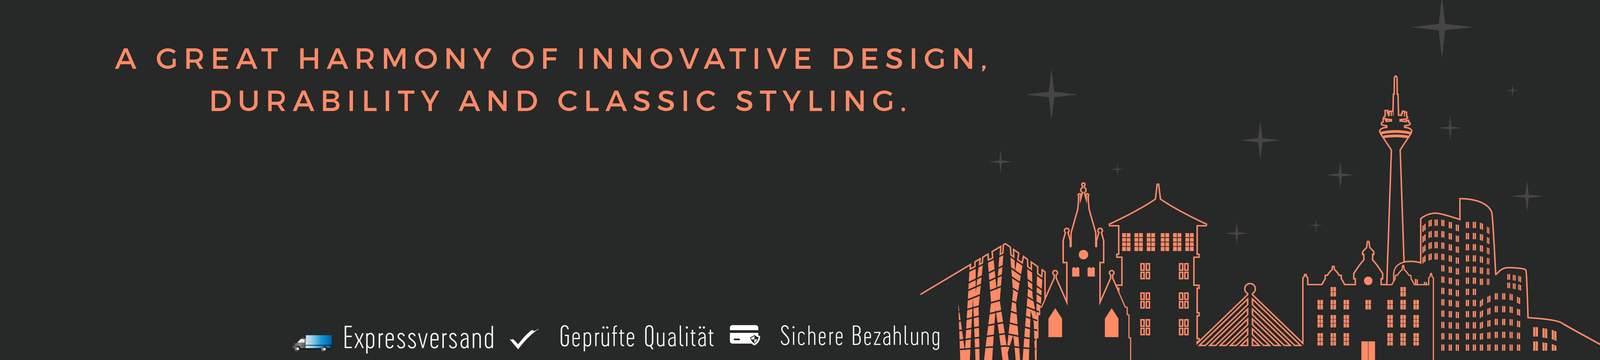 design.alishba